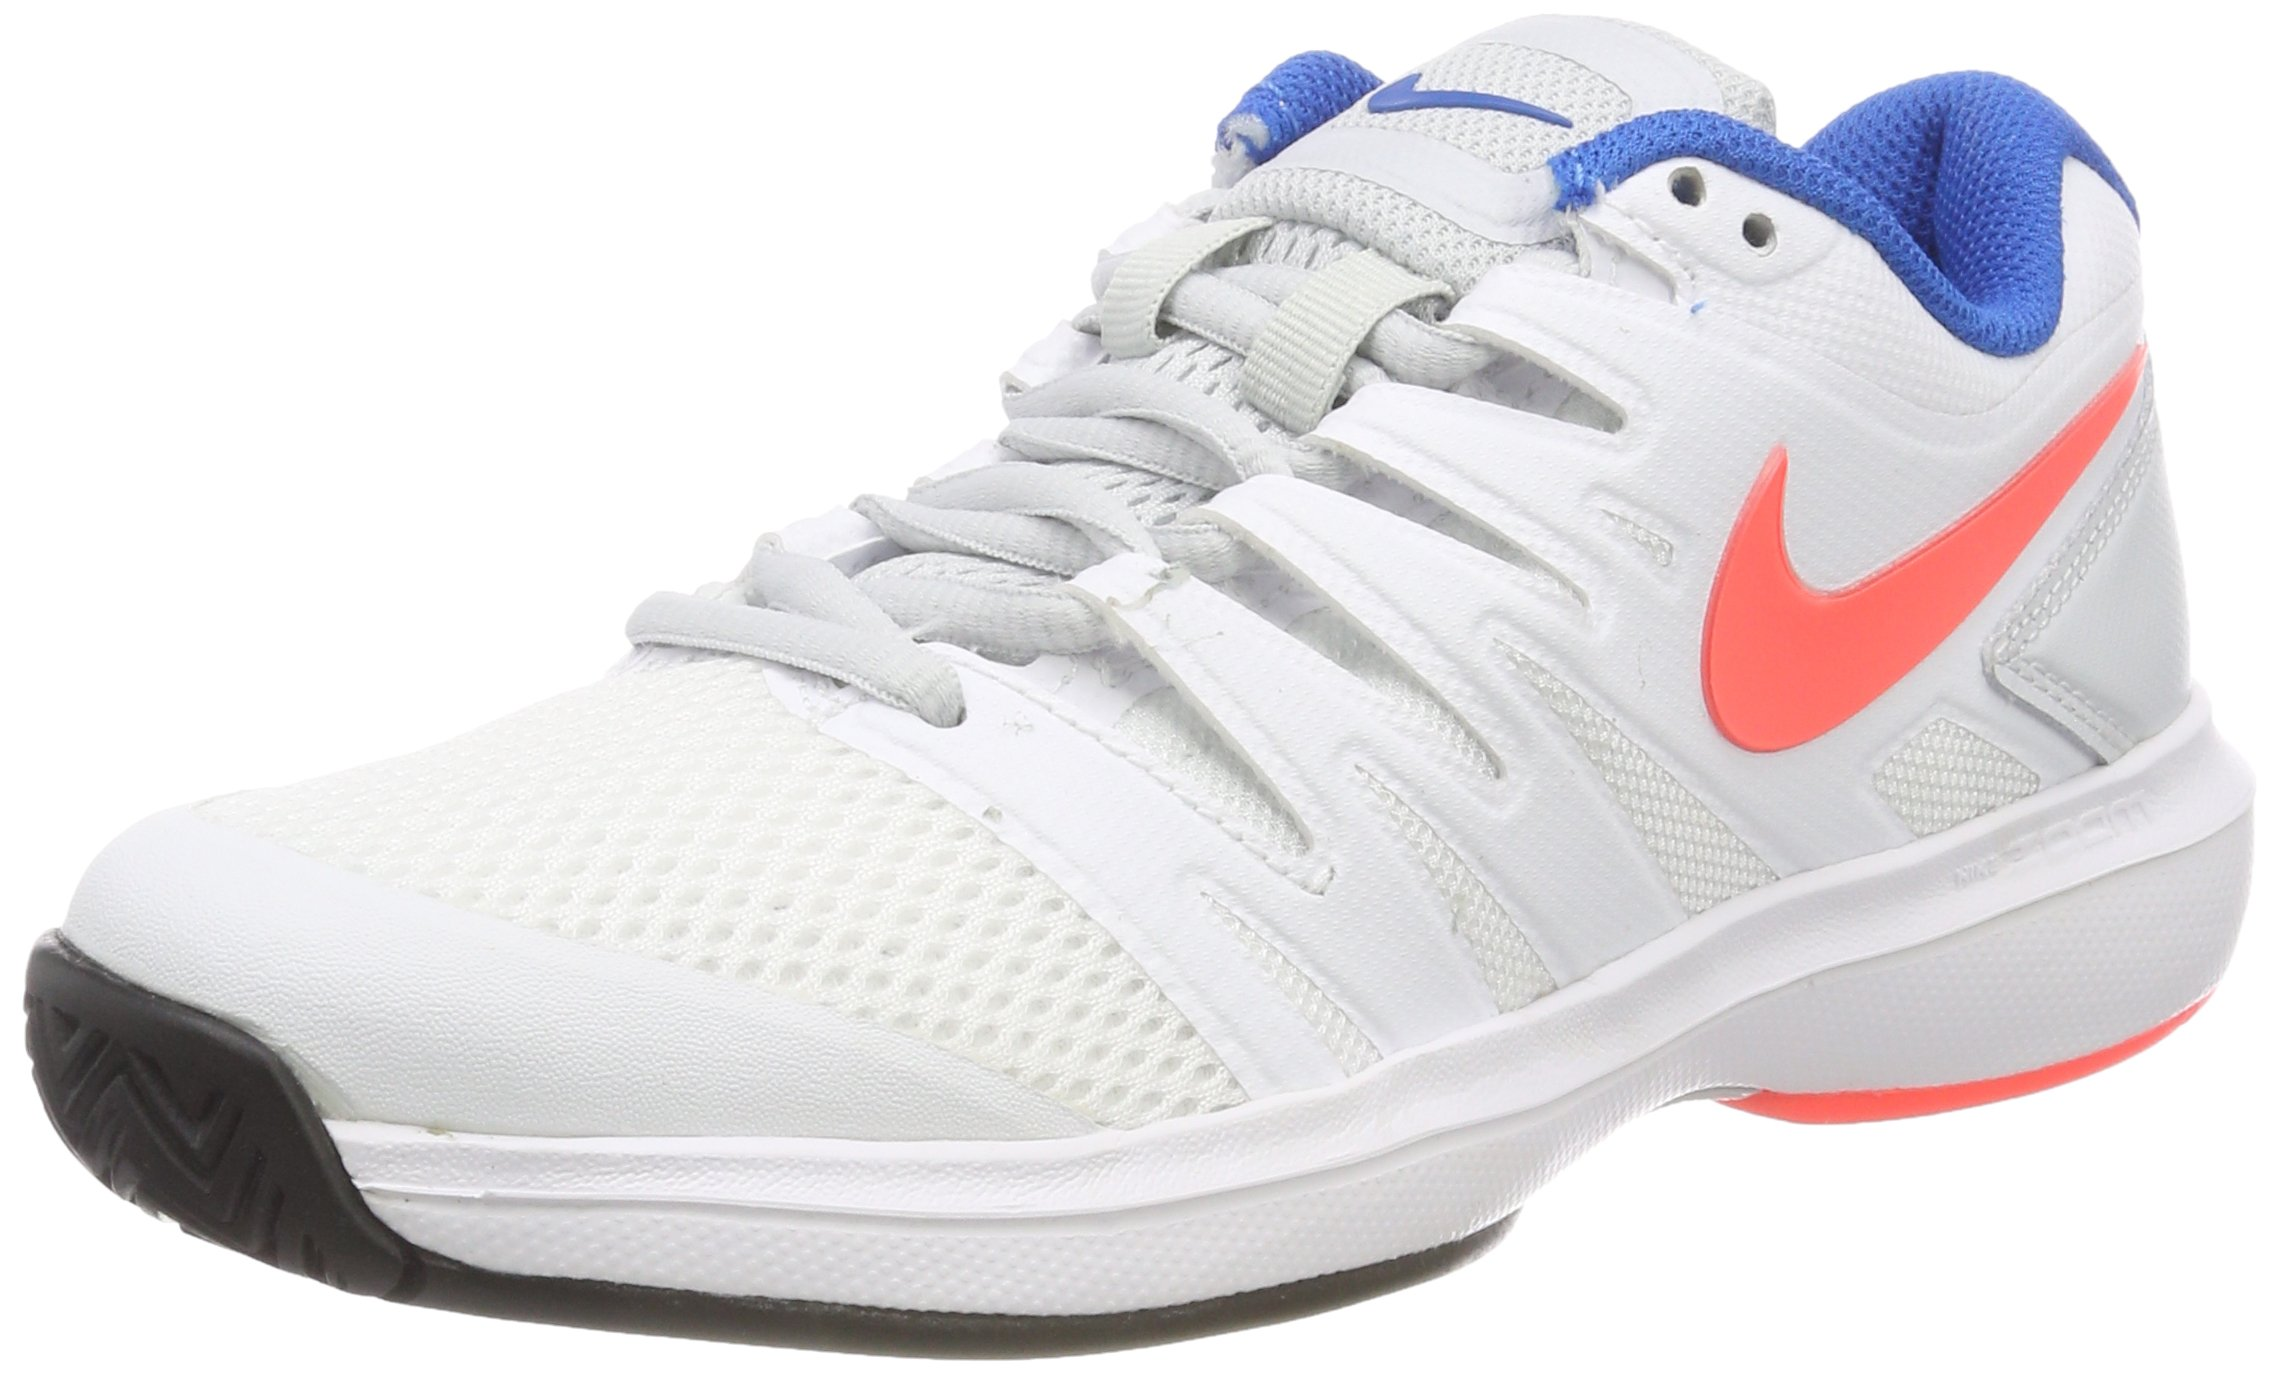 bd432389ad47 Galleon - NIKE Women s Air Zoom Prestige Tennis Shoes (6 B US ...